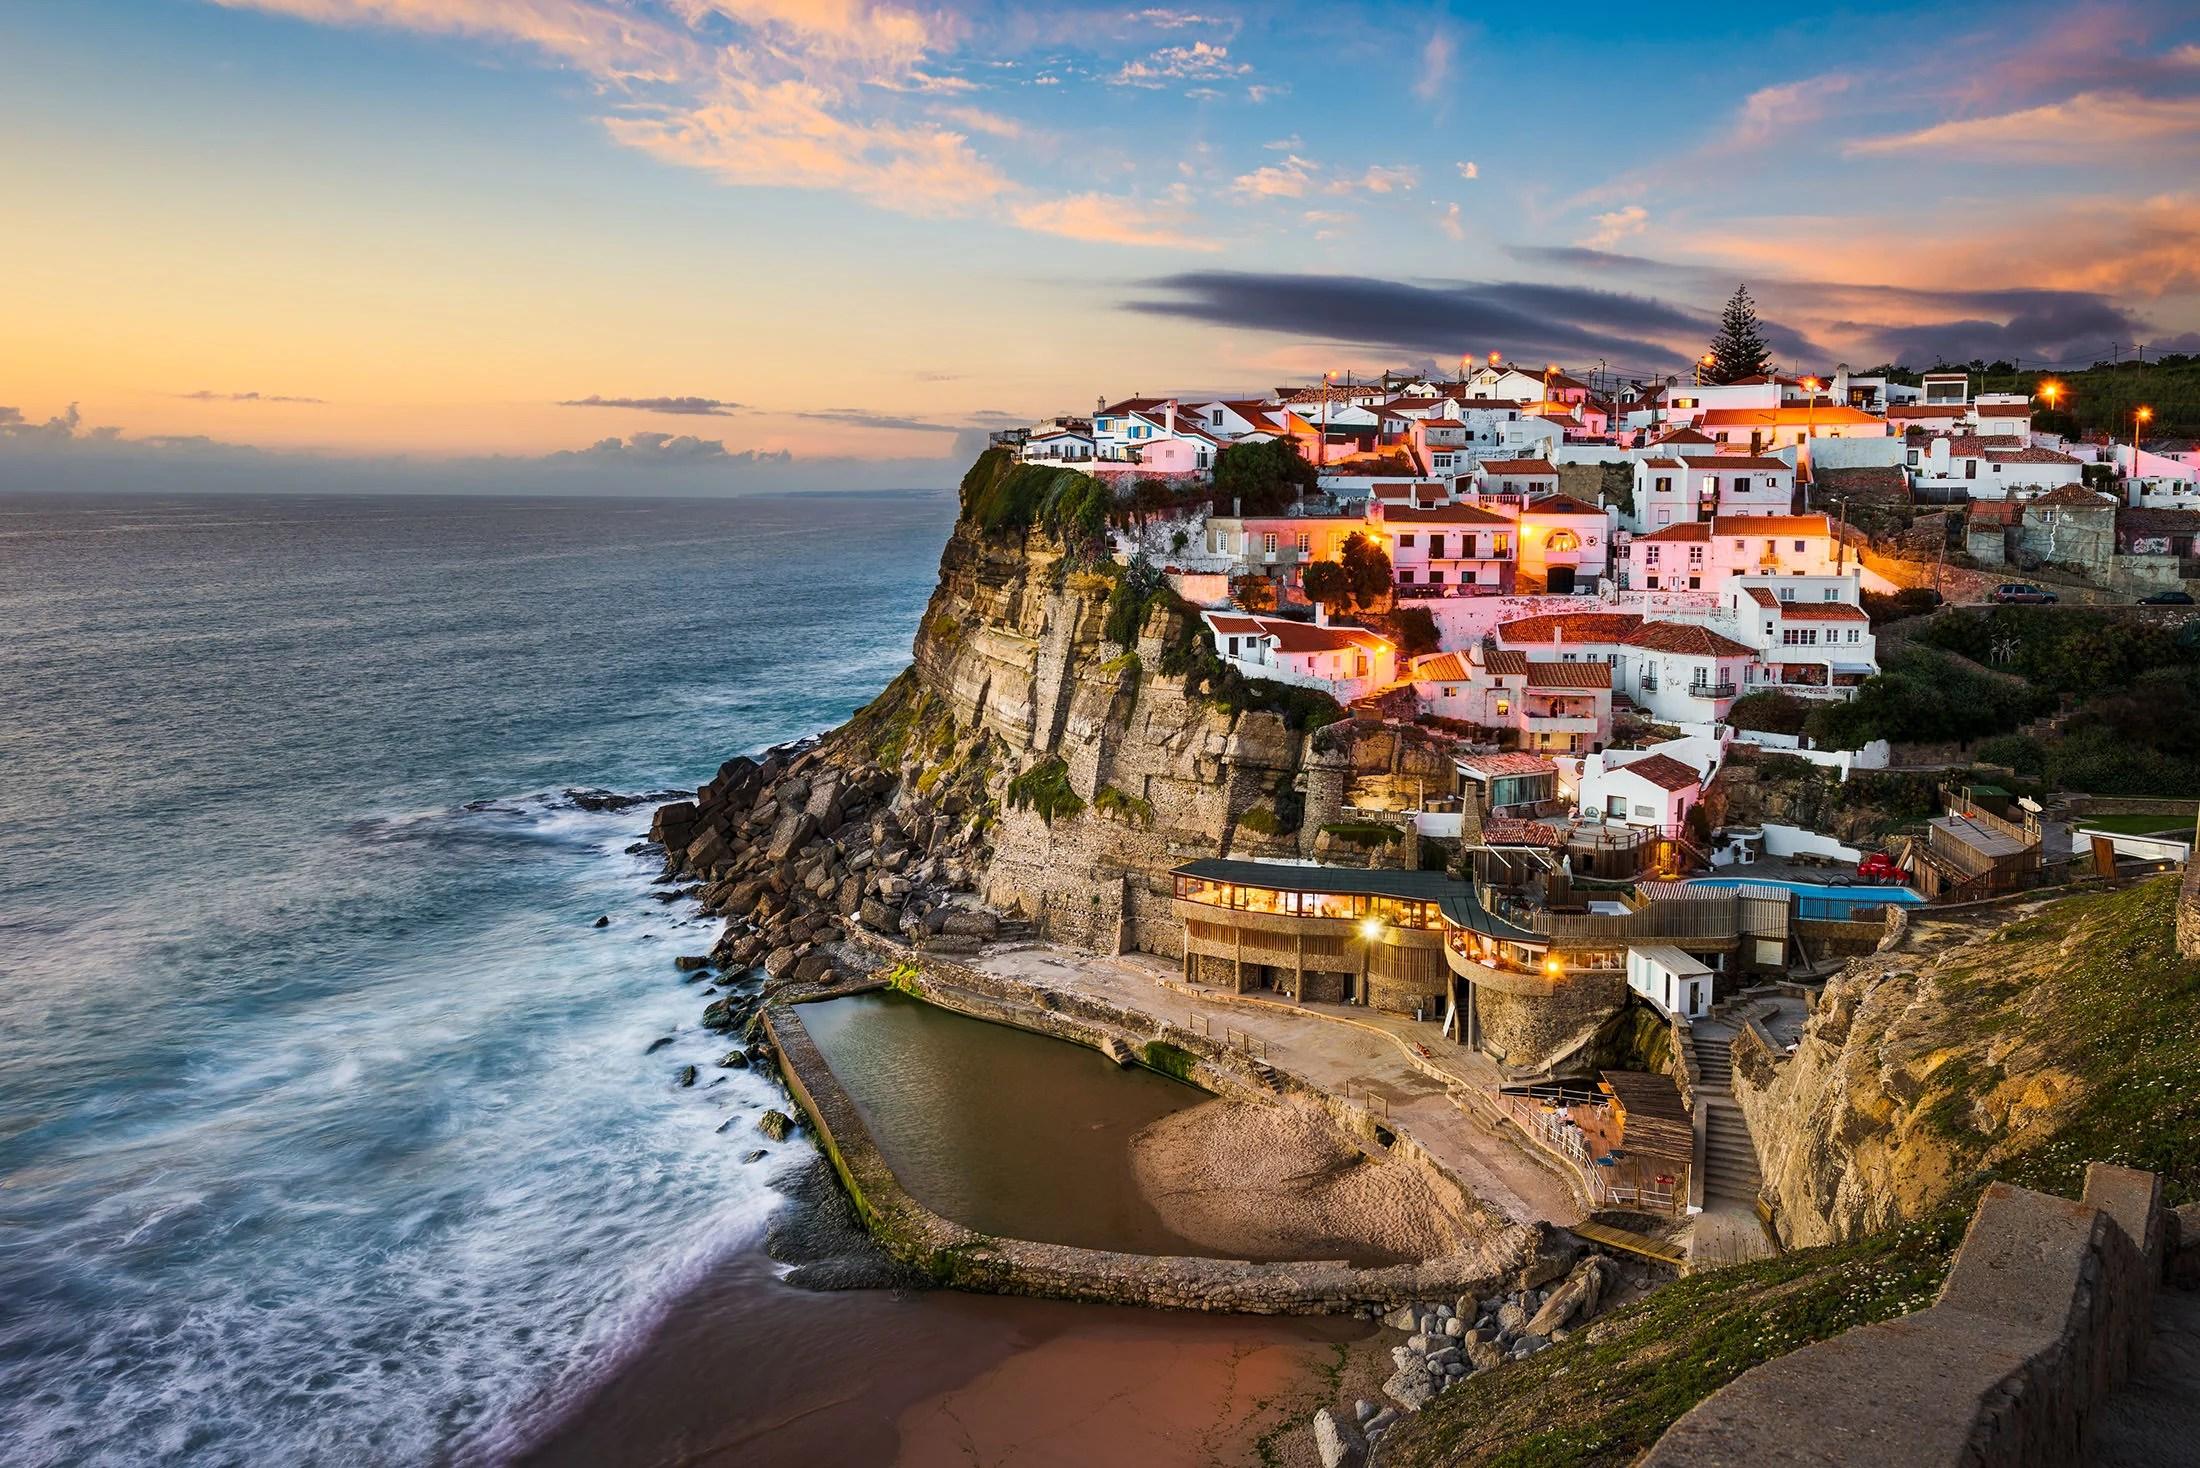 Azenhas do Mar is a great photo spot to shoot the sunset near Sintra